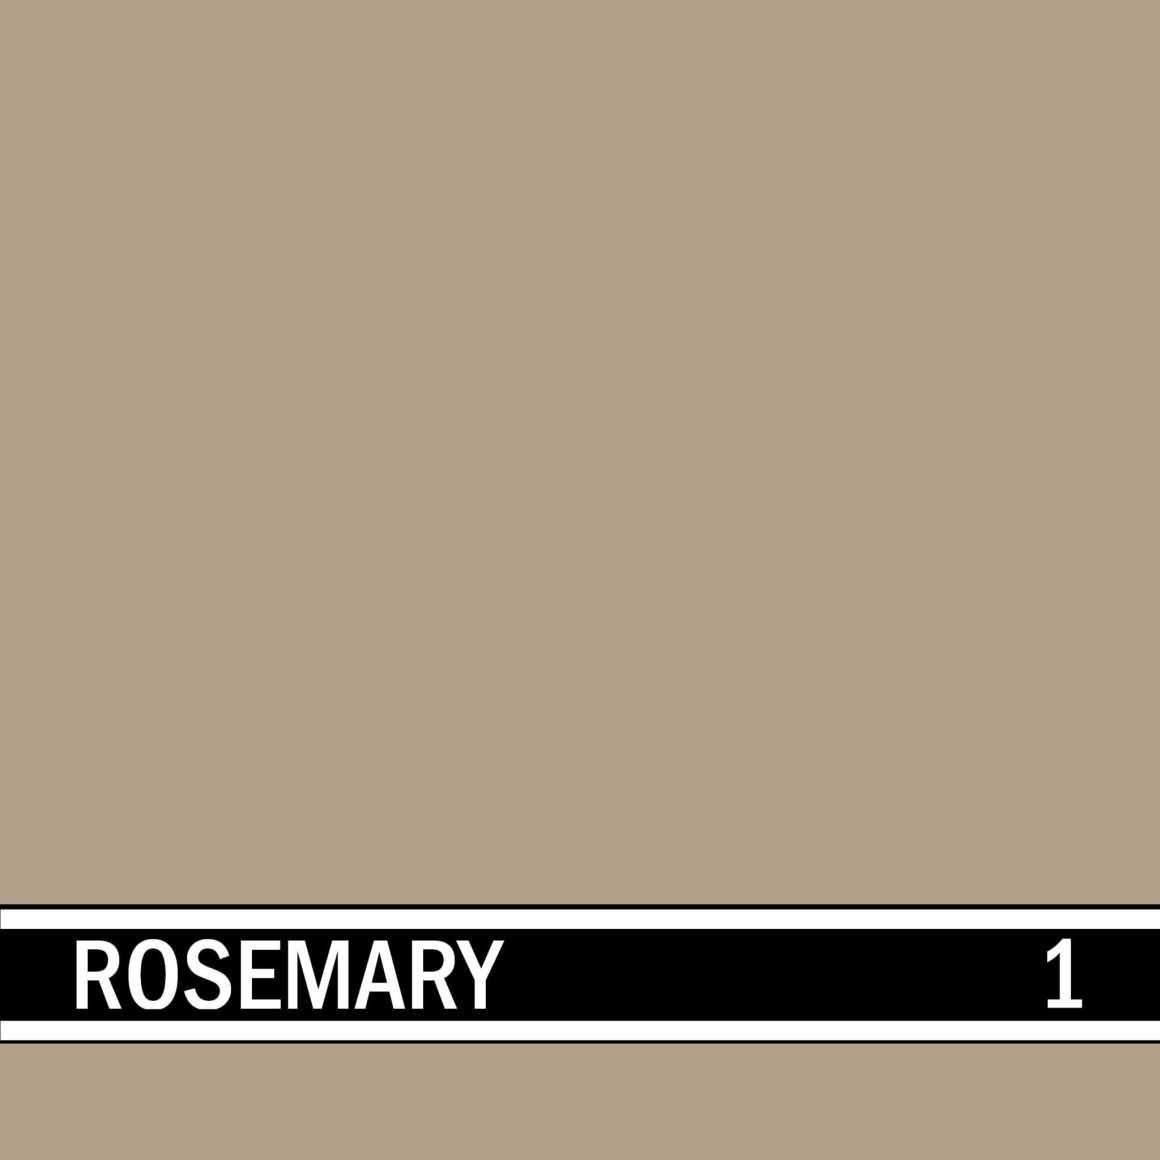 Rosemary integral concrete color for stamped concrete and decorative colored concrete